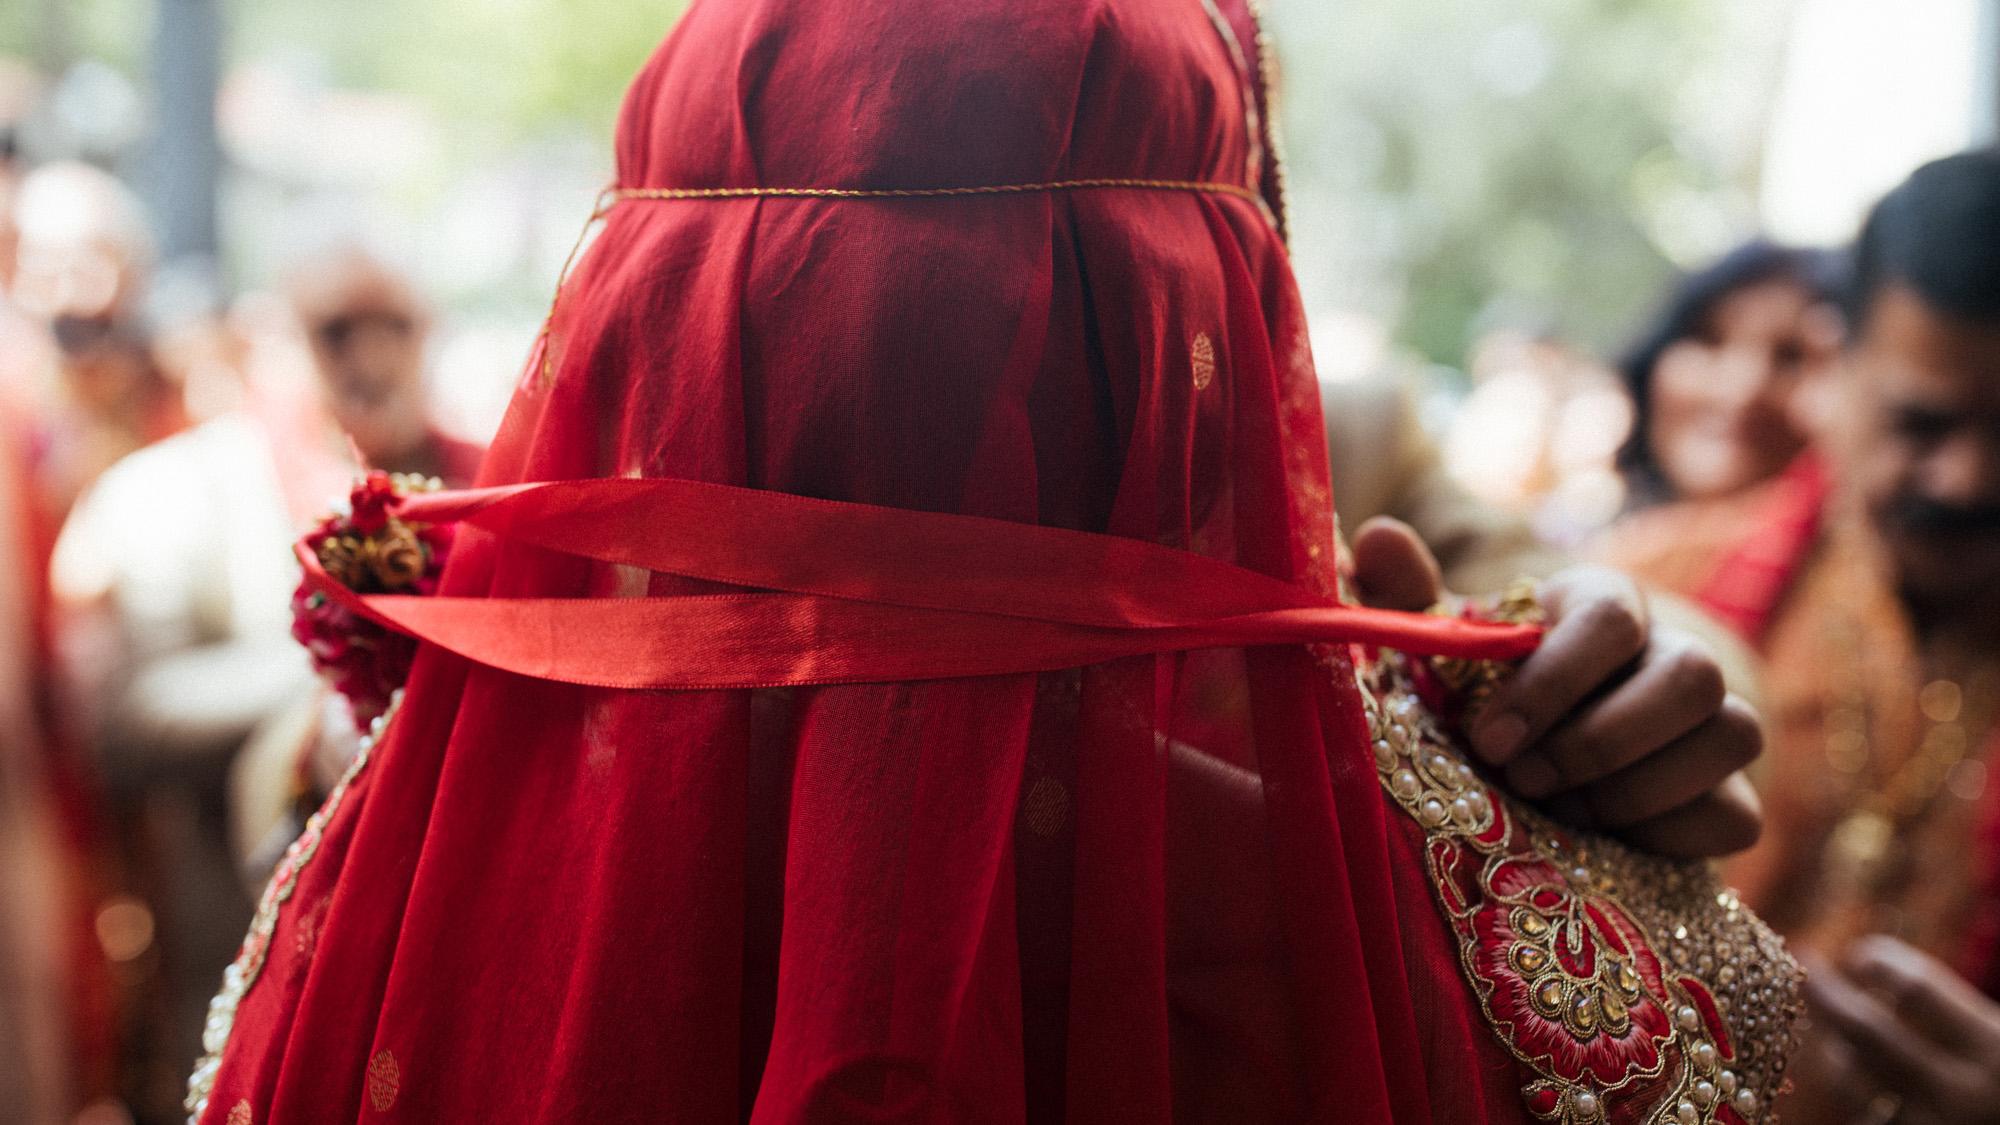 anu_maneesh_alec_vanderboom_Indian_wedding_photography-0084.jpg